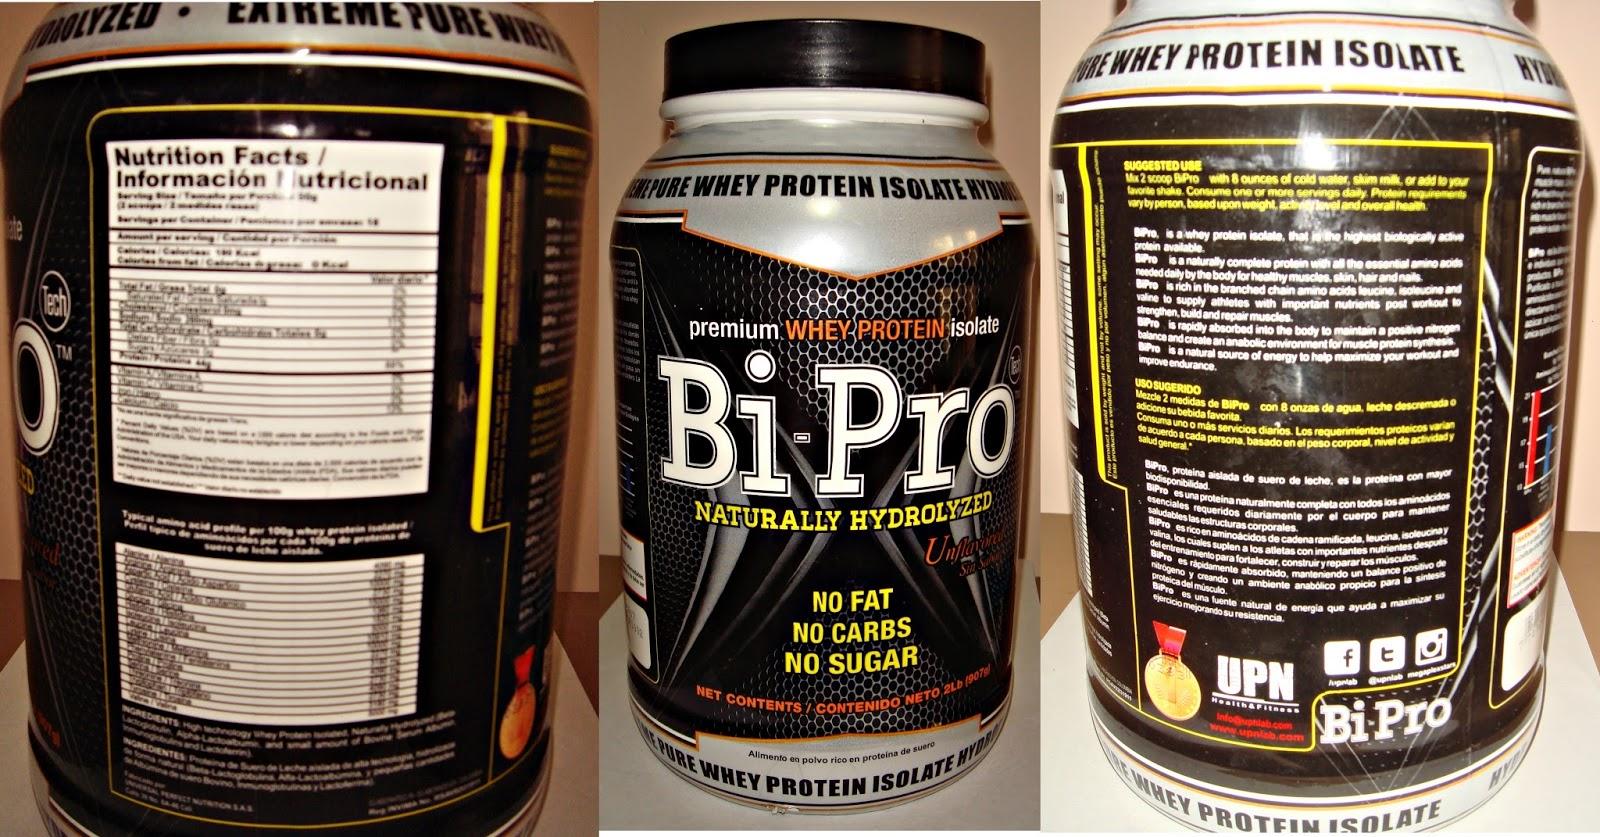 BiPro proteína de UPN: análisis, características, opiniones, review